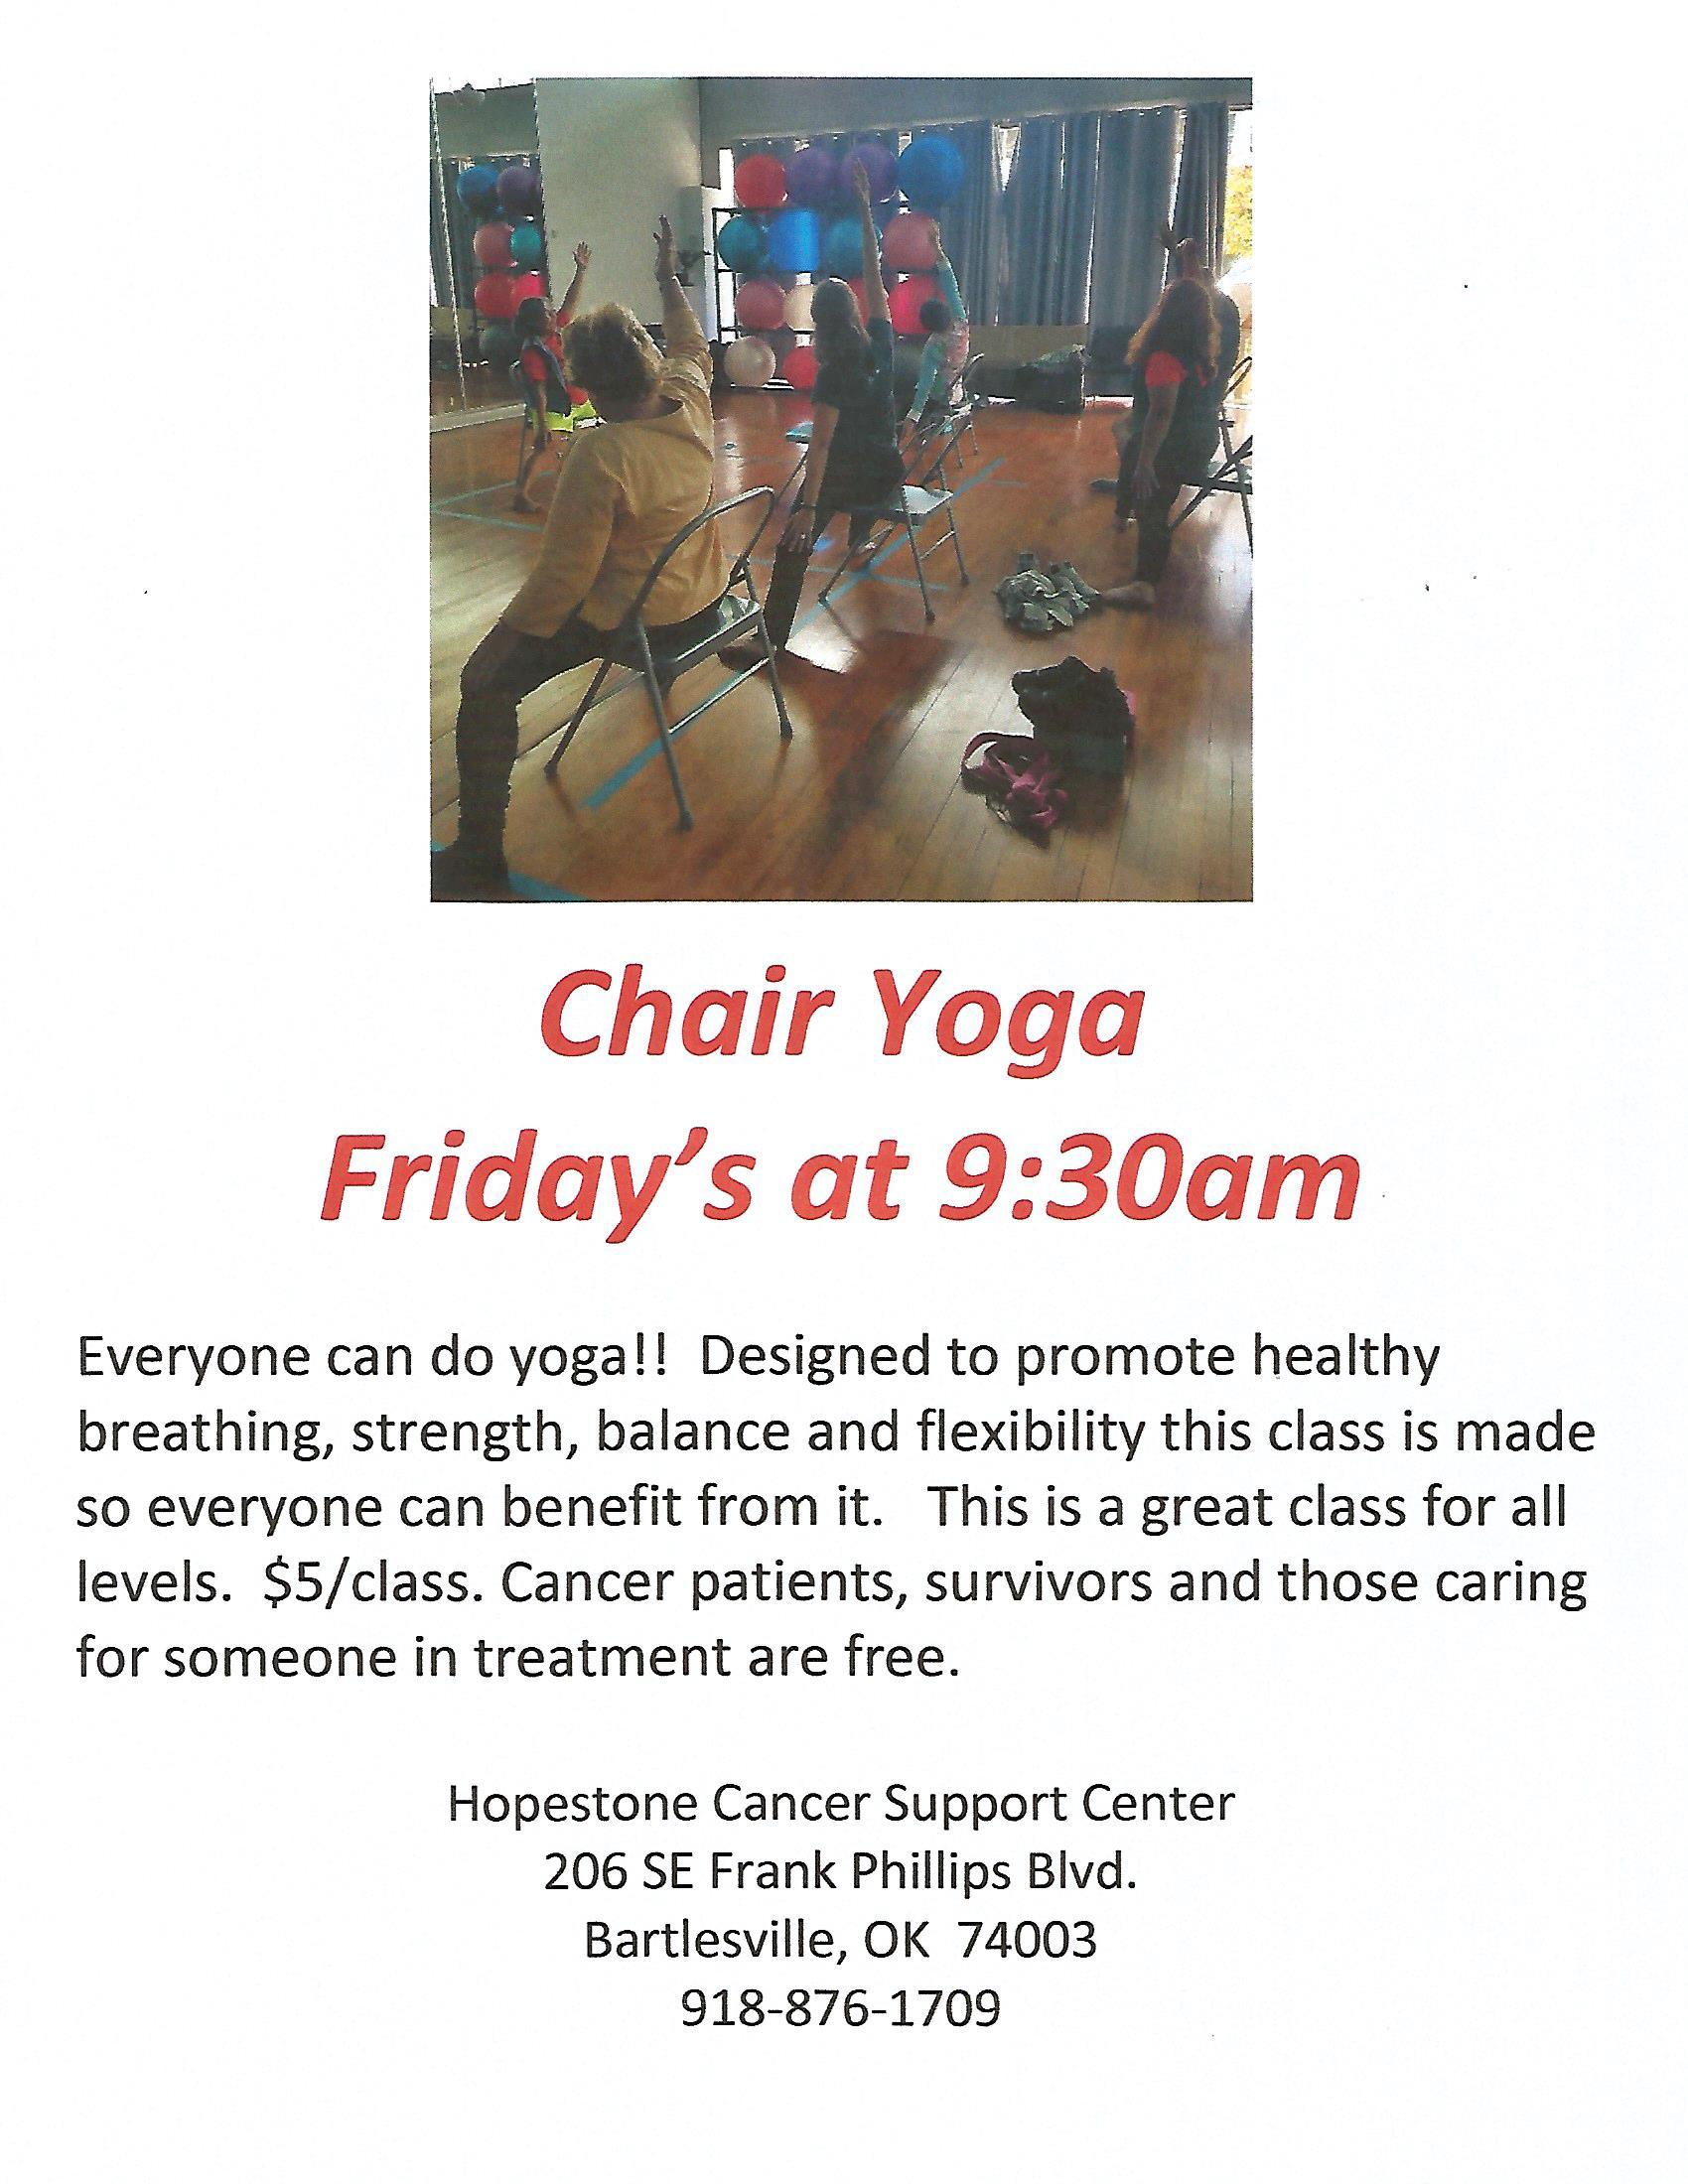 Chair Yoga Class.jpg